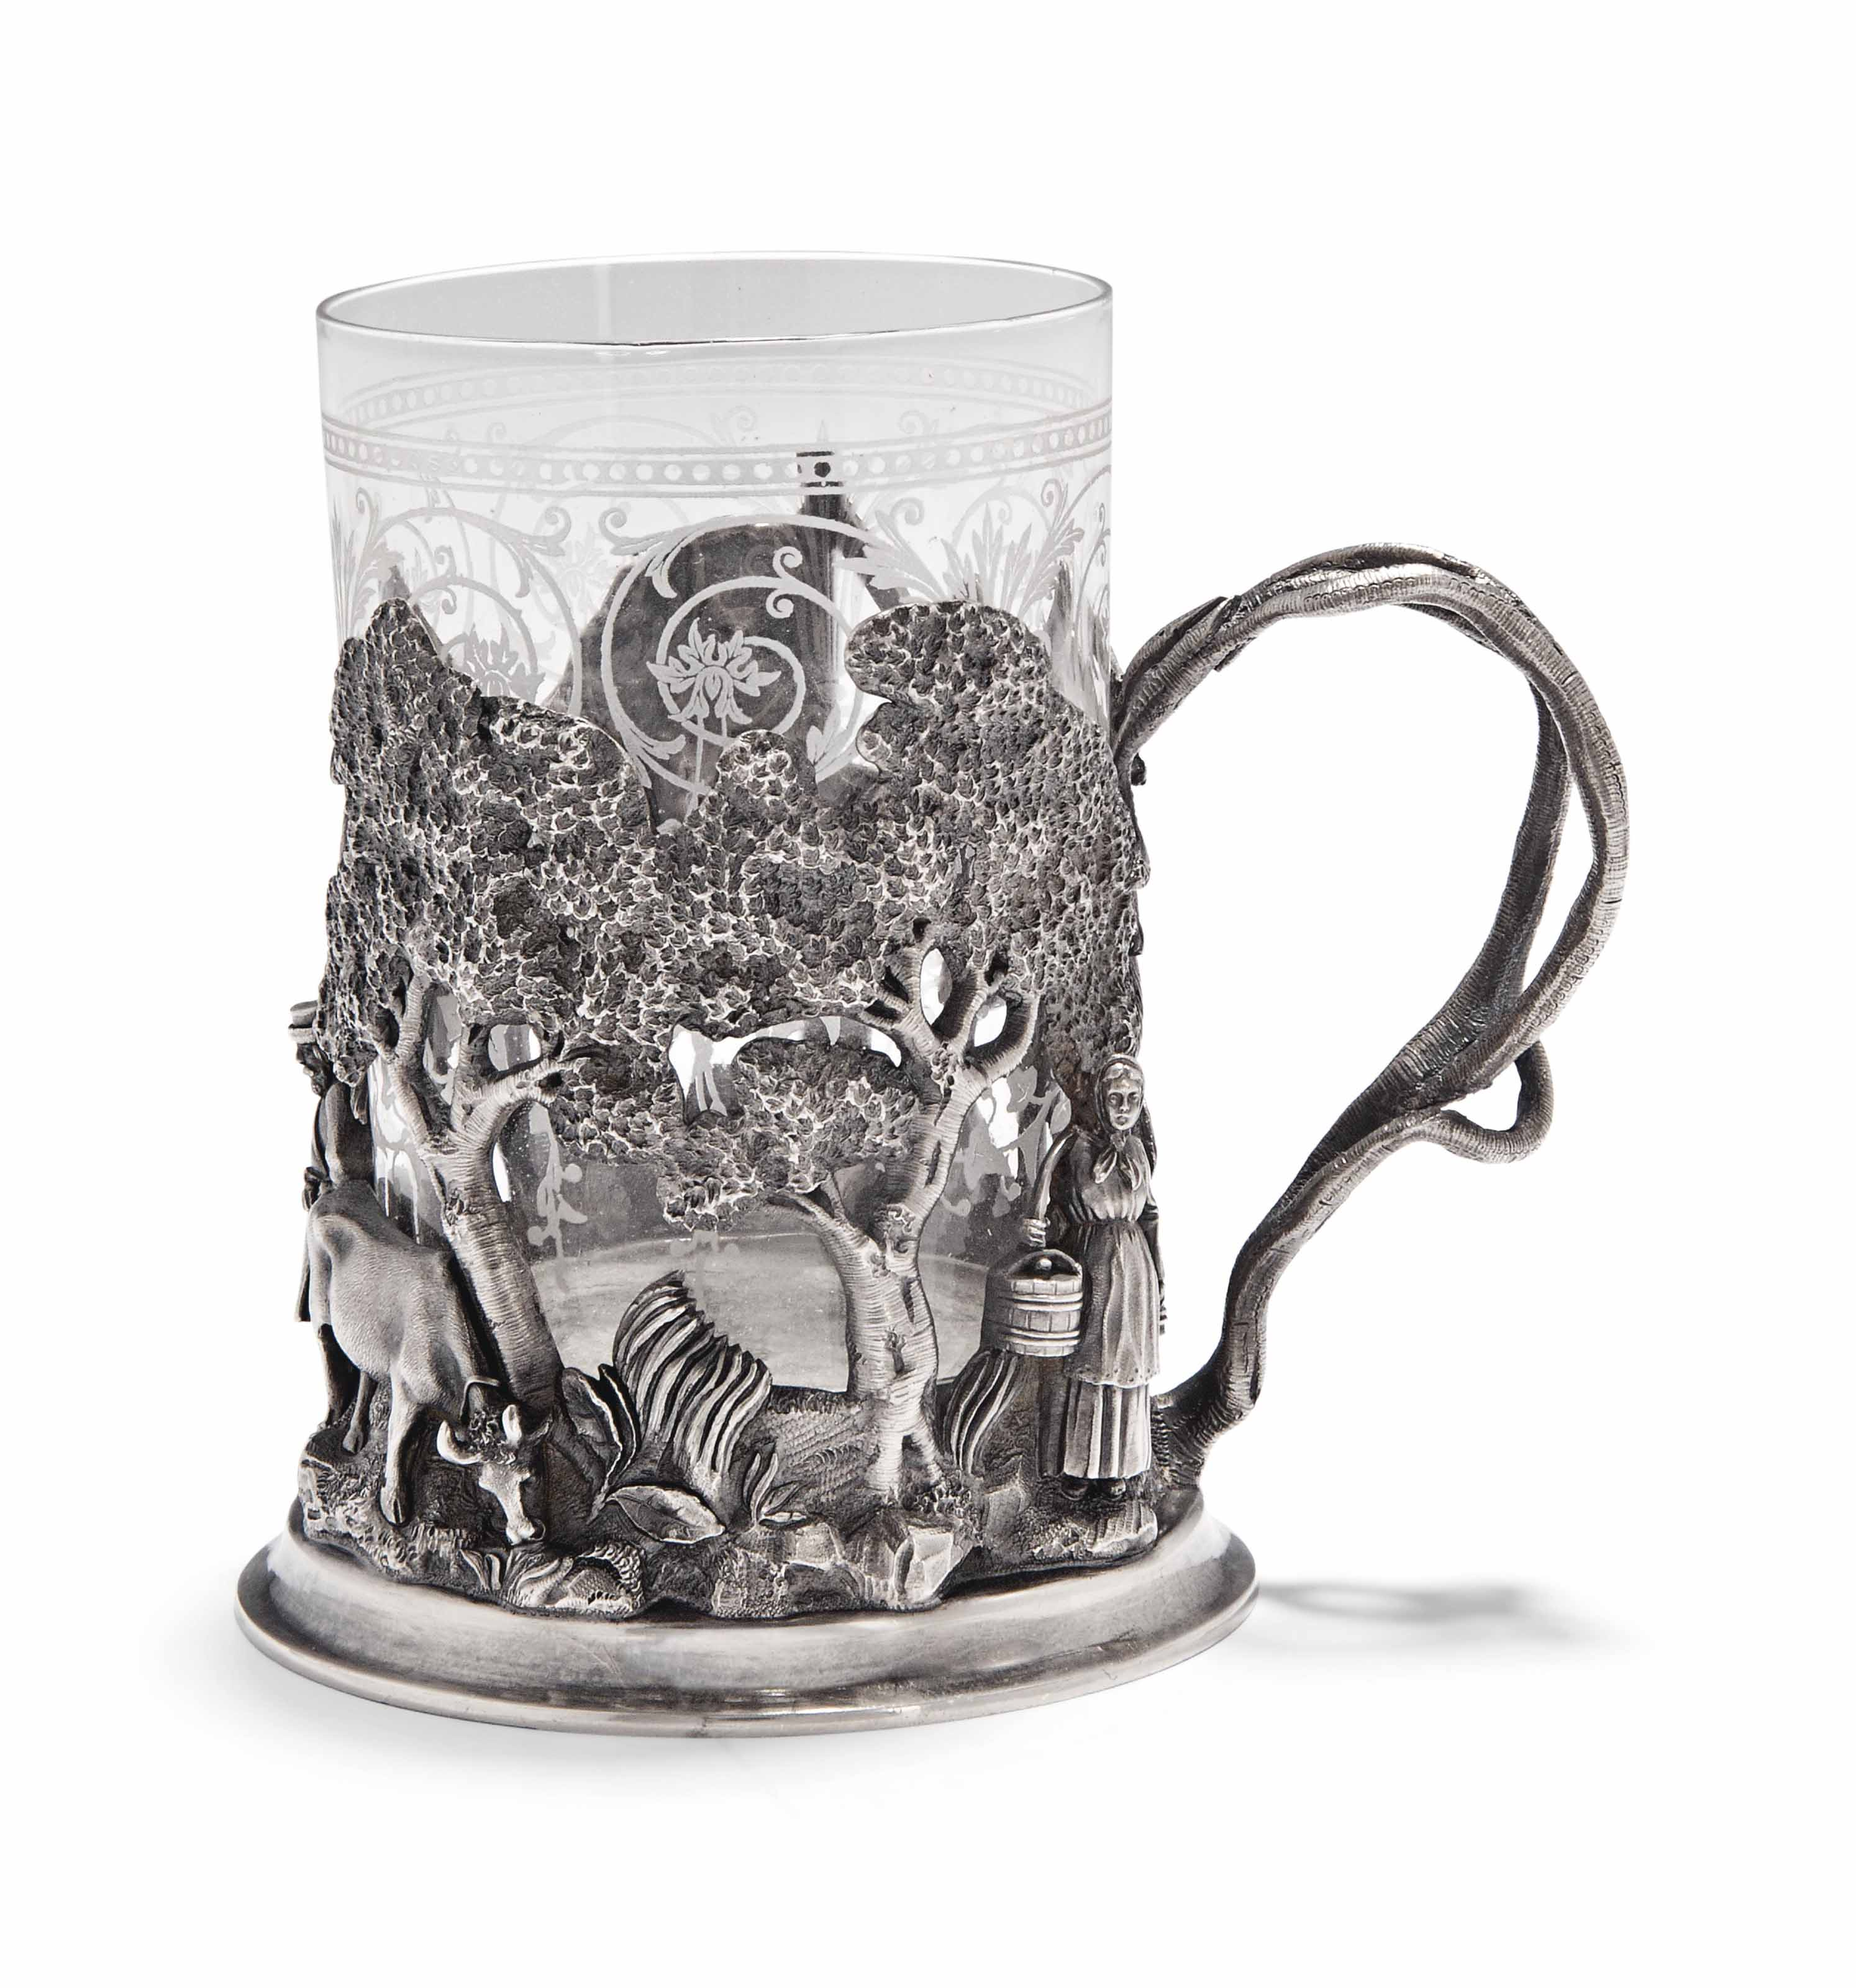 A RUSSIAN SILVER TEA-GLASS HOL